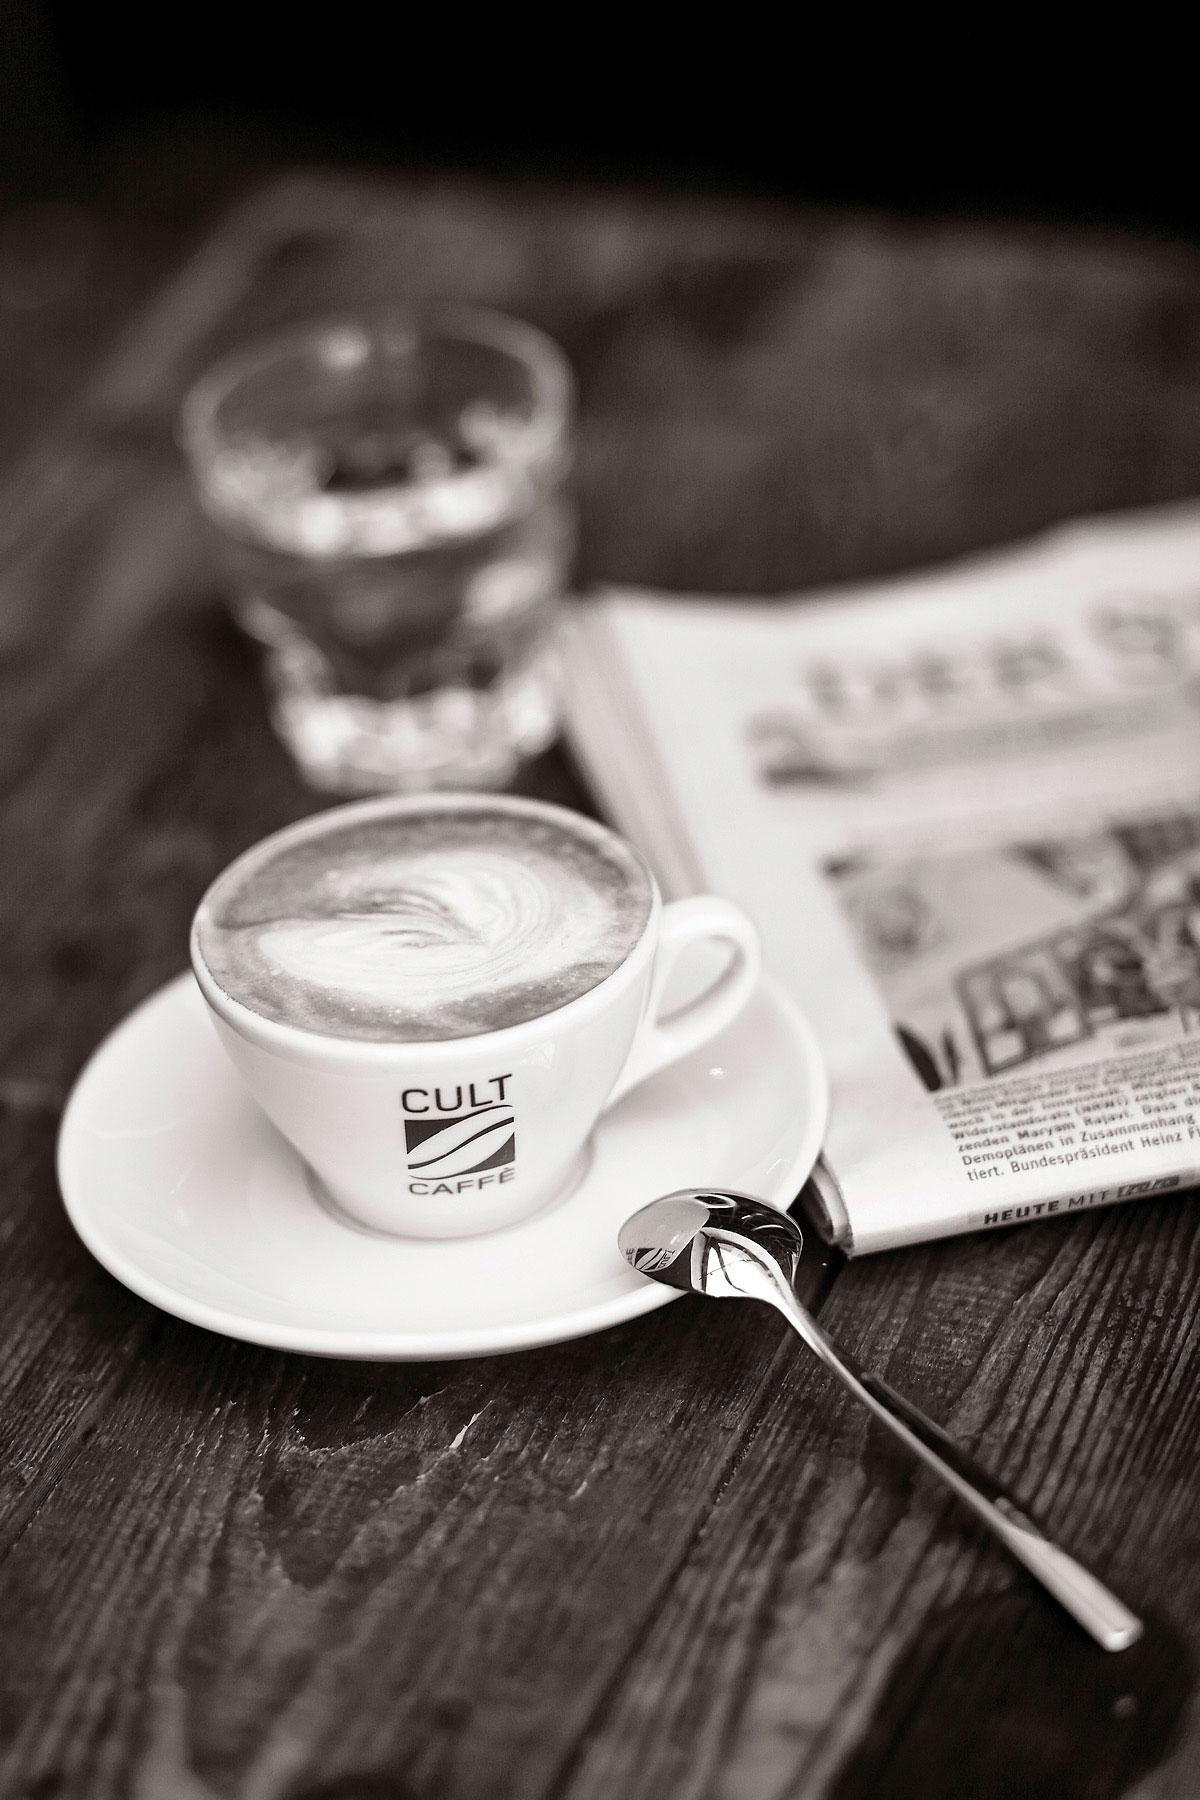 Cult-Caffe-Sappert-Auftragsfoto-at_-_MG_9955-ok